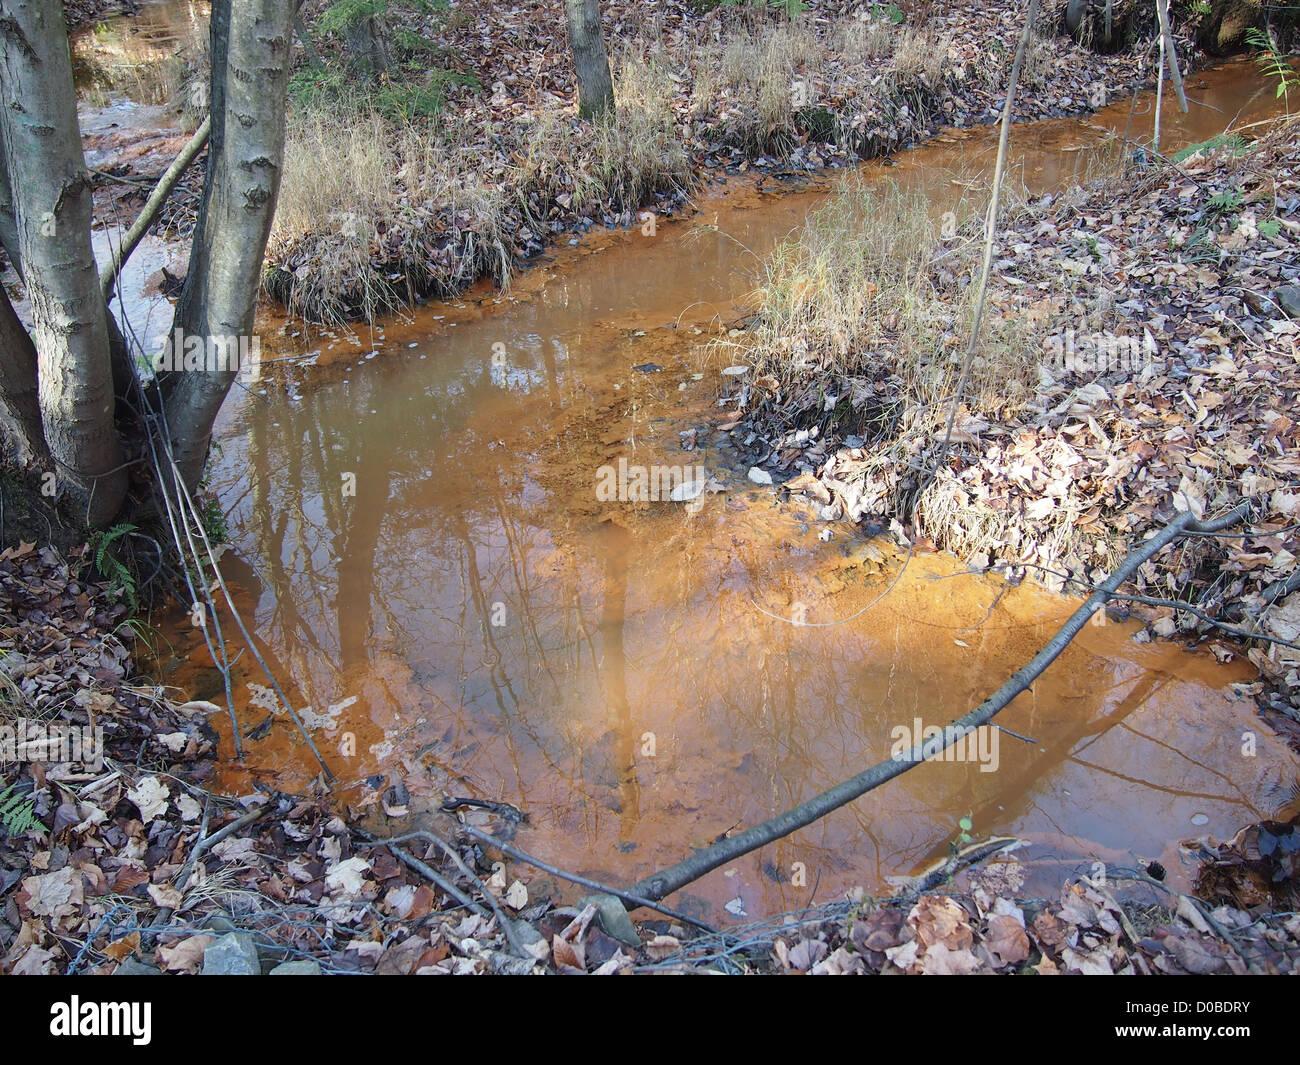 Contaminated water - Stock Image